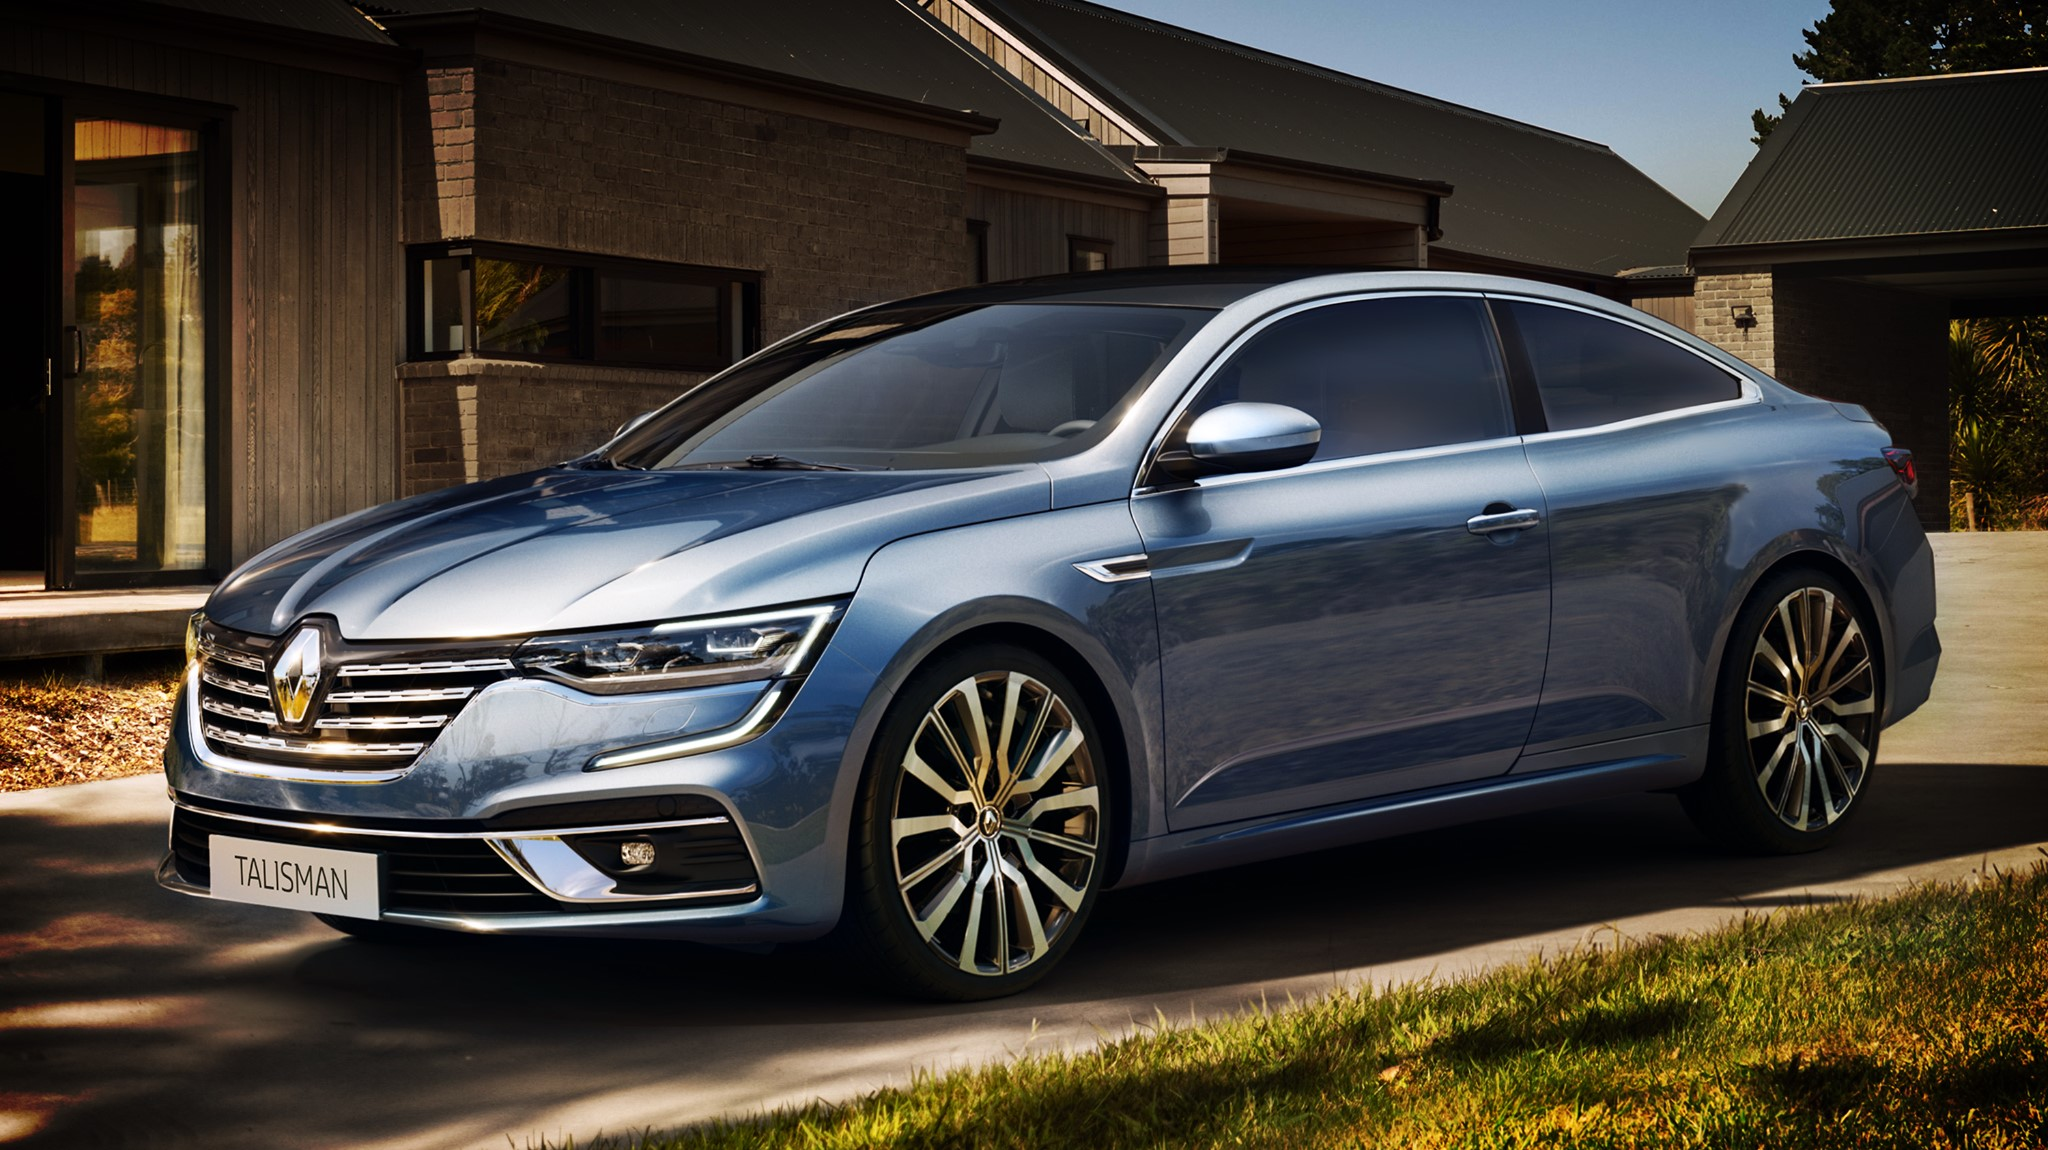 Renault-Talisman-Coupe-rendering